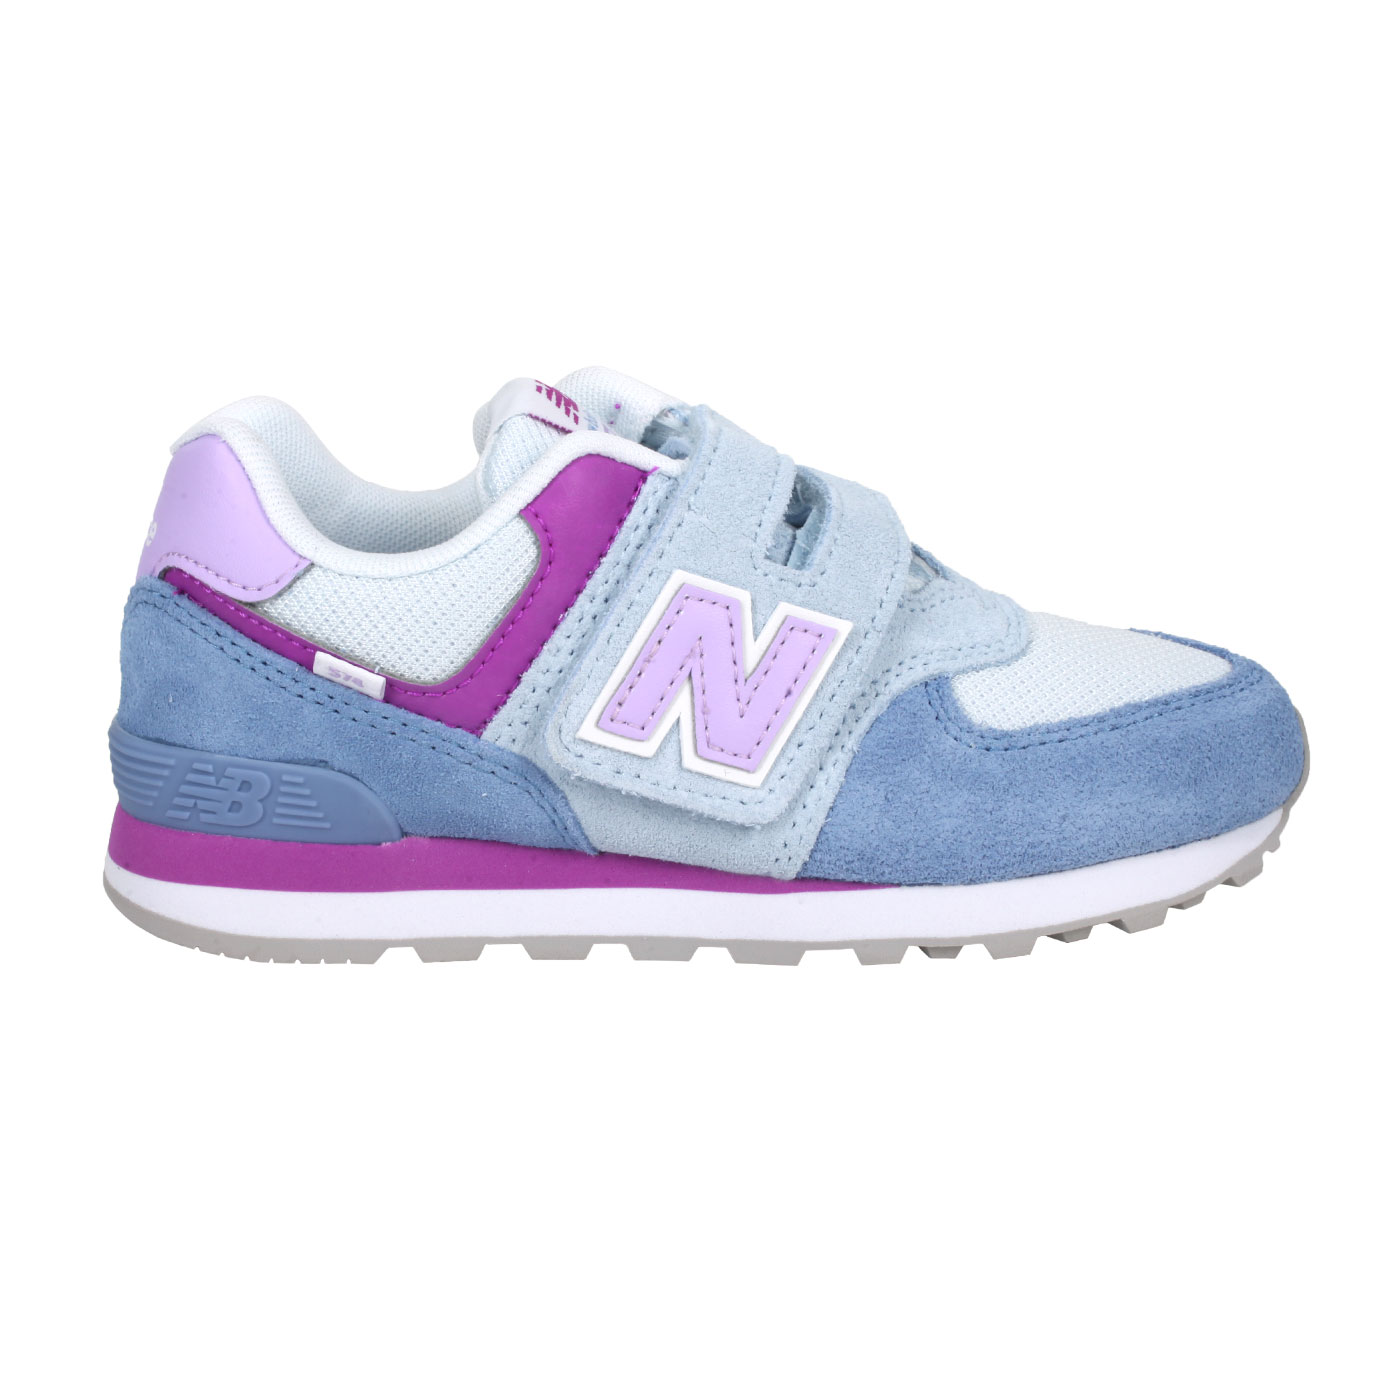 NEW BALANCE 中童休閒運動鞋-WIDE PV574SL2